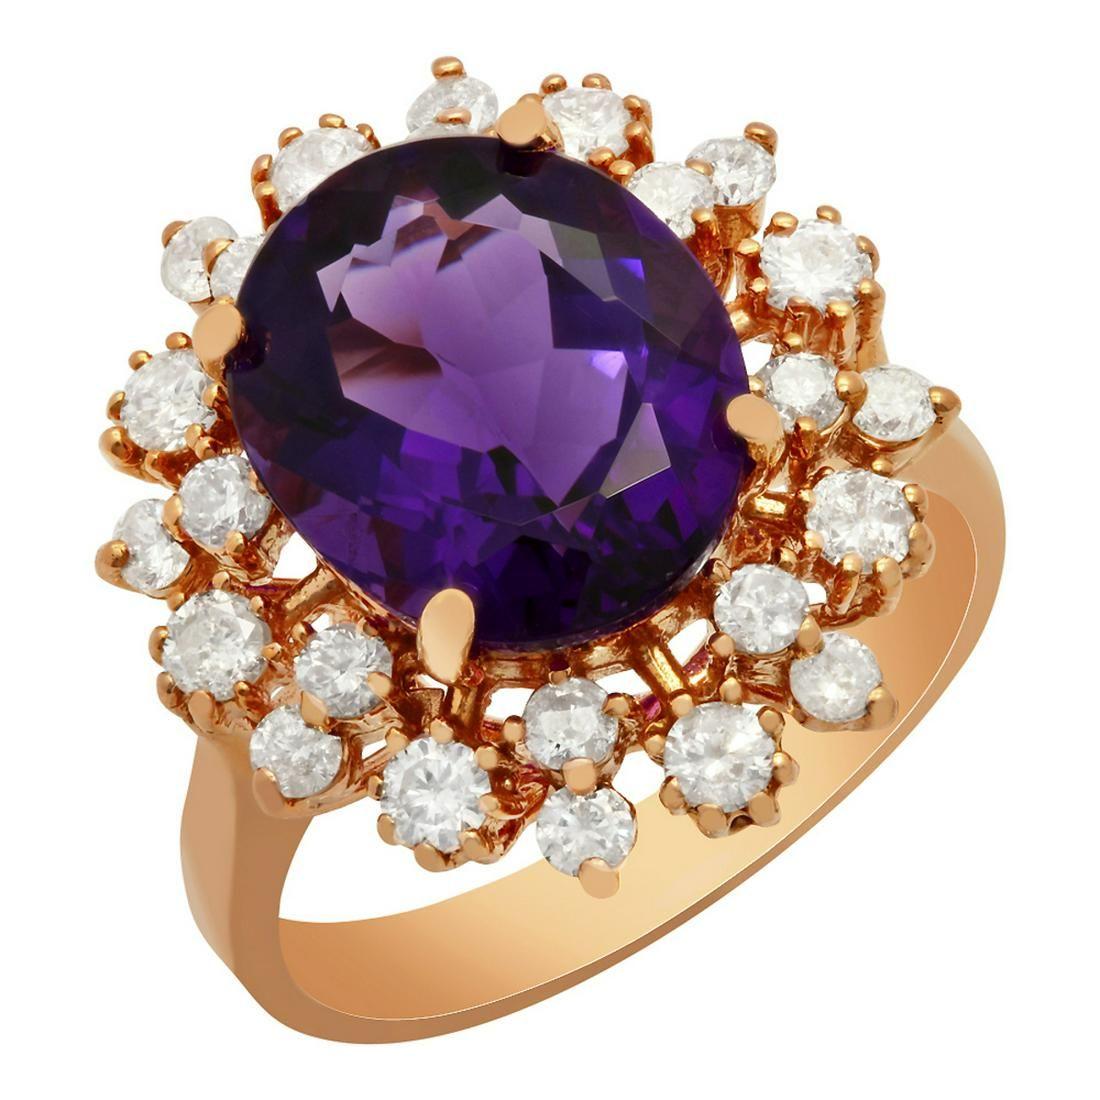 14k Rose Gold 4.41ct Amethyst 1.06ct Diamond Ring